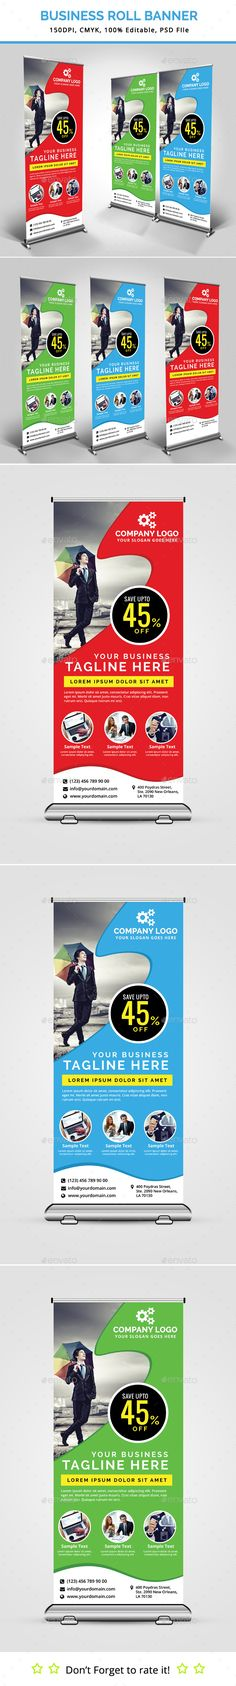 Business Roll Up Banner Template #design Download: http://graphicriver.net/item/business-roll-up-banner-v16/13091134?ref=ksioks